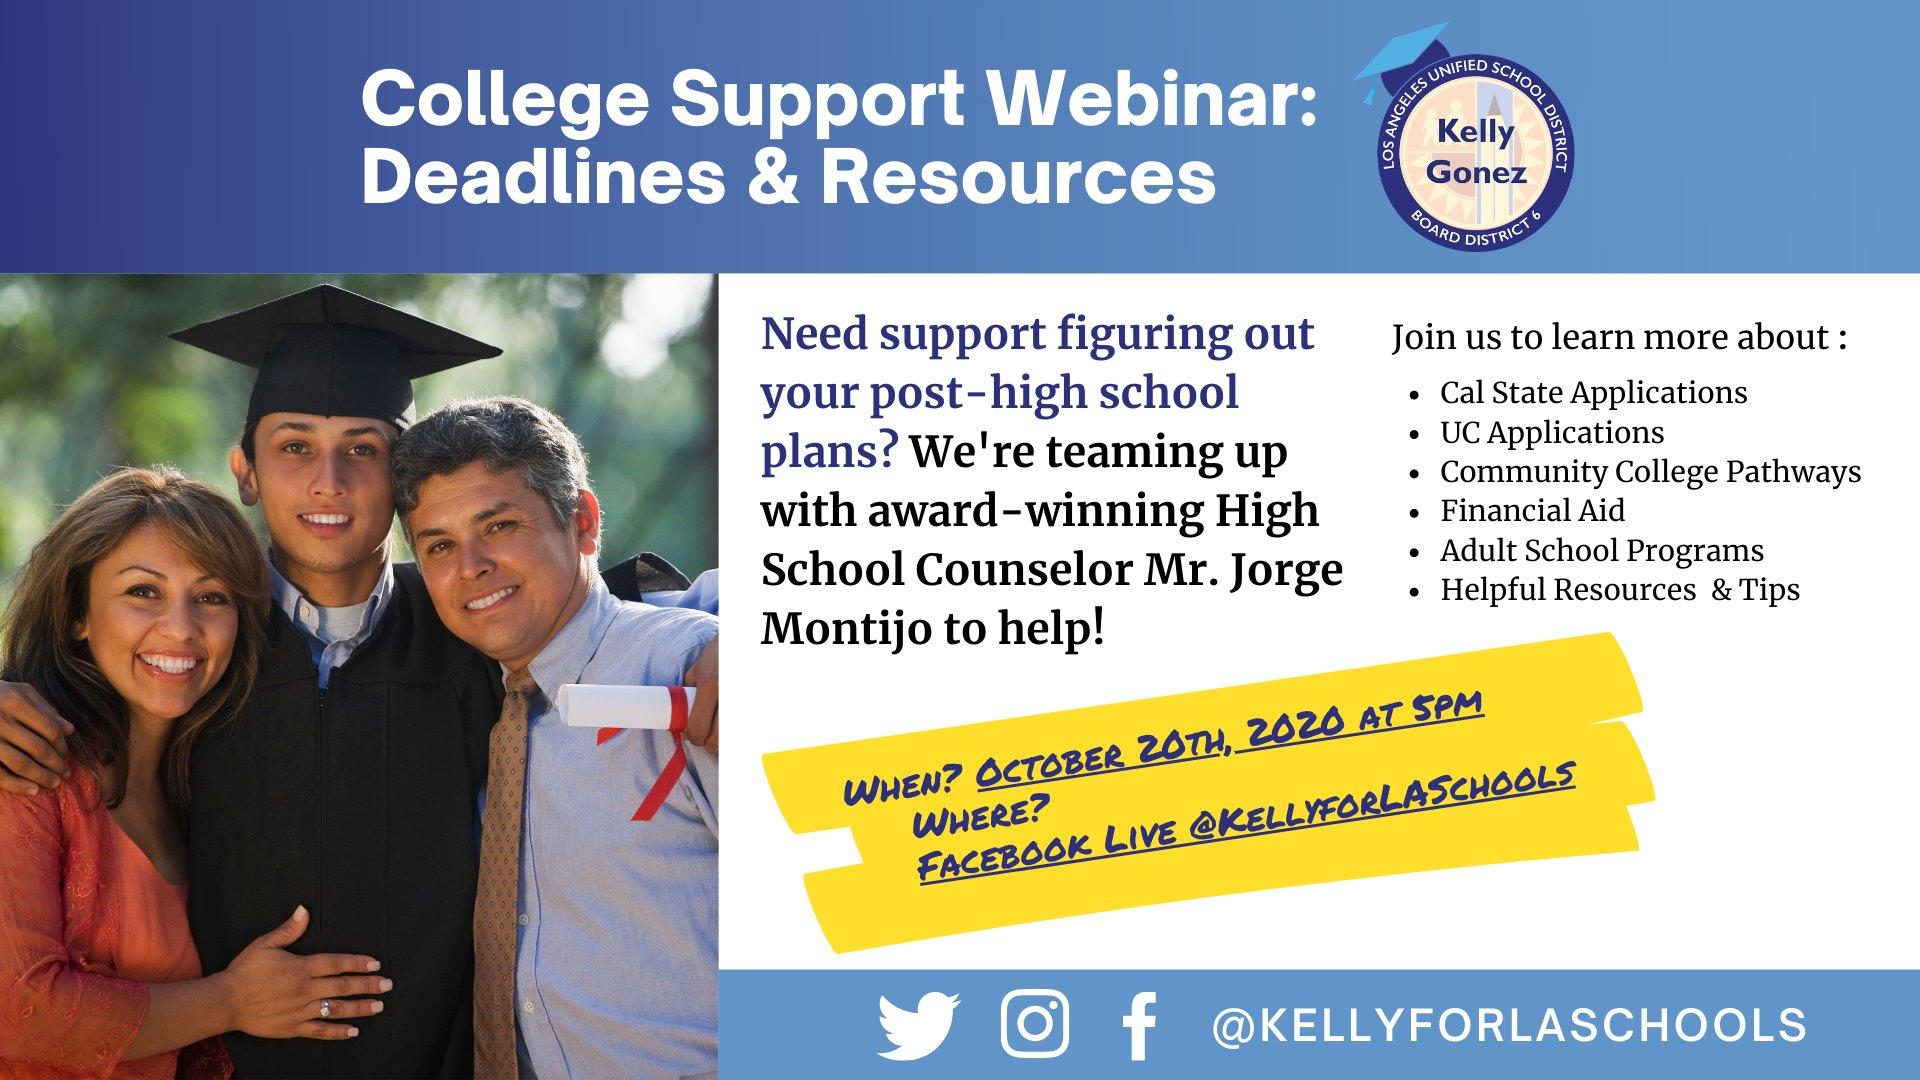 College Support Webinar